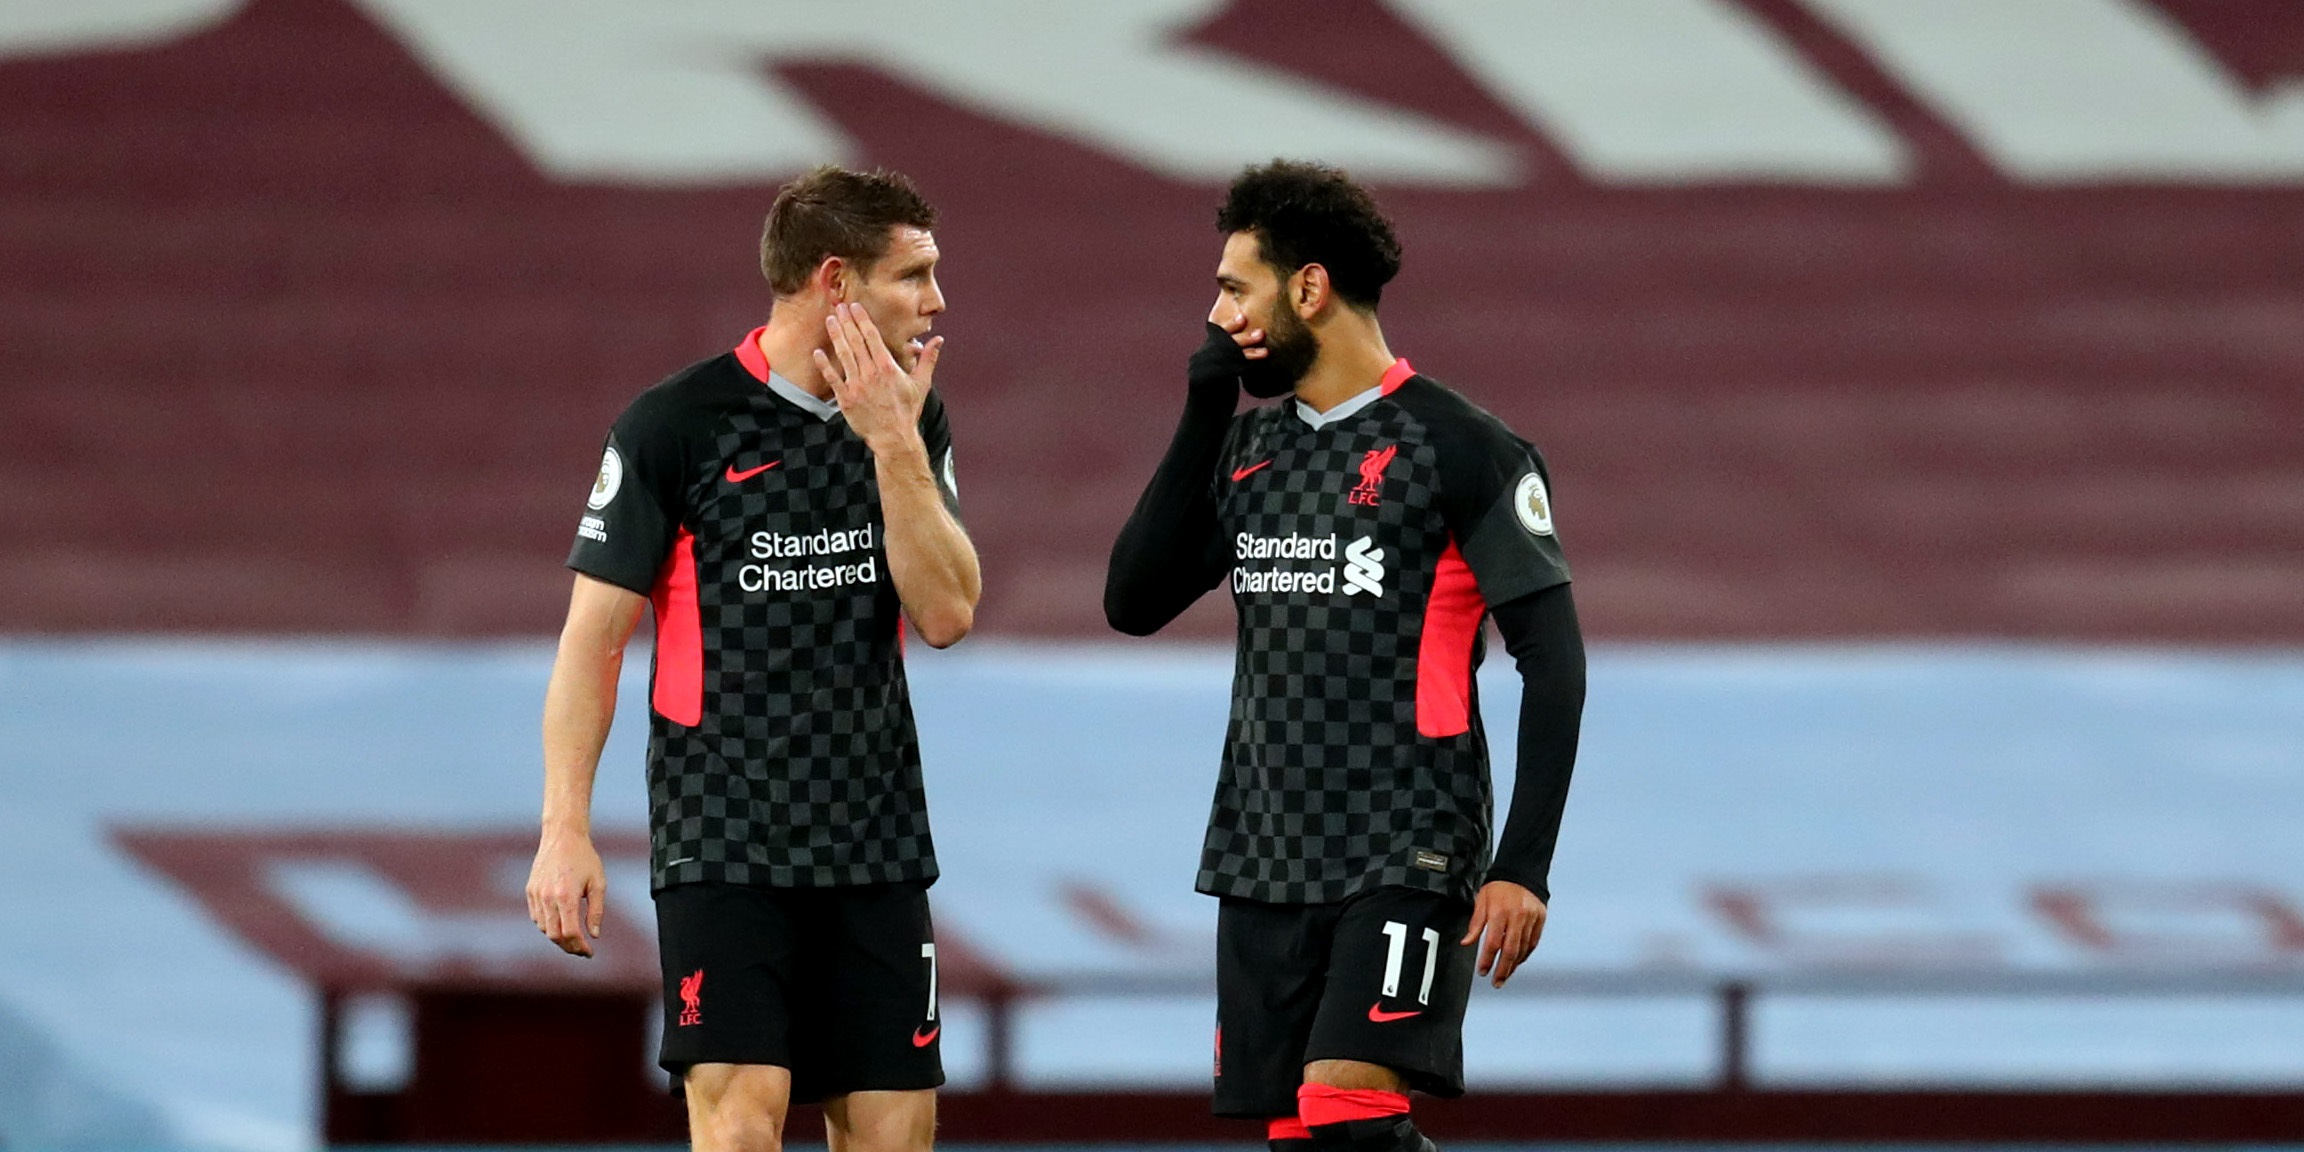 Milner, Messi & Ronaldo examples justify handing Salah extended terms, says Jamie Carragher